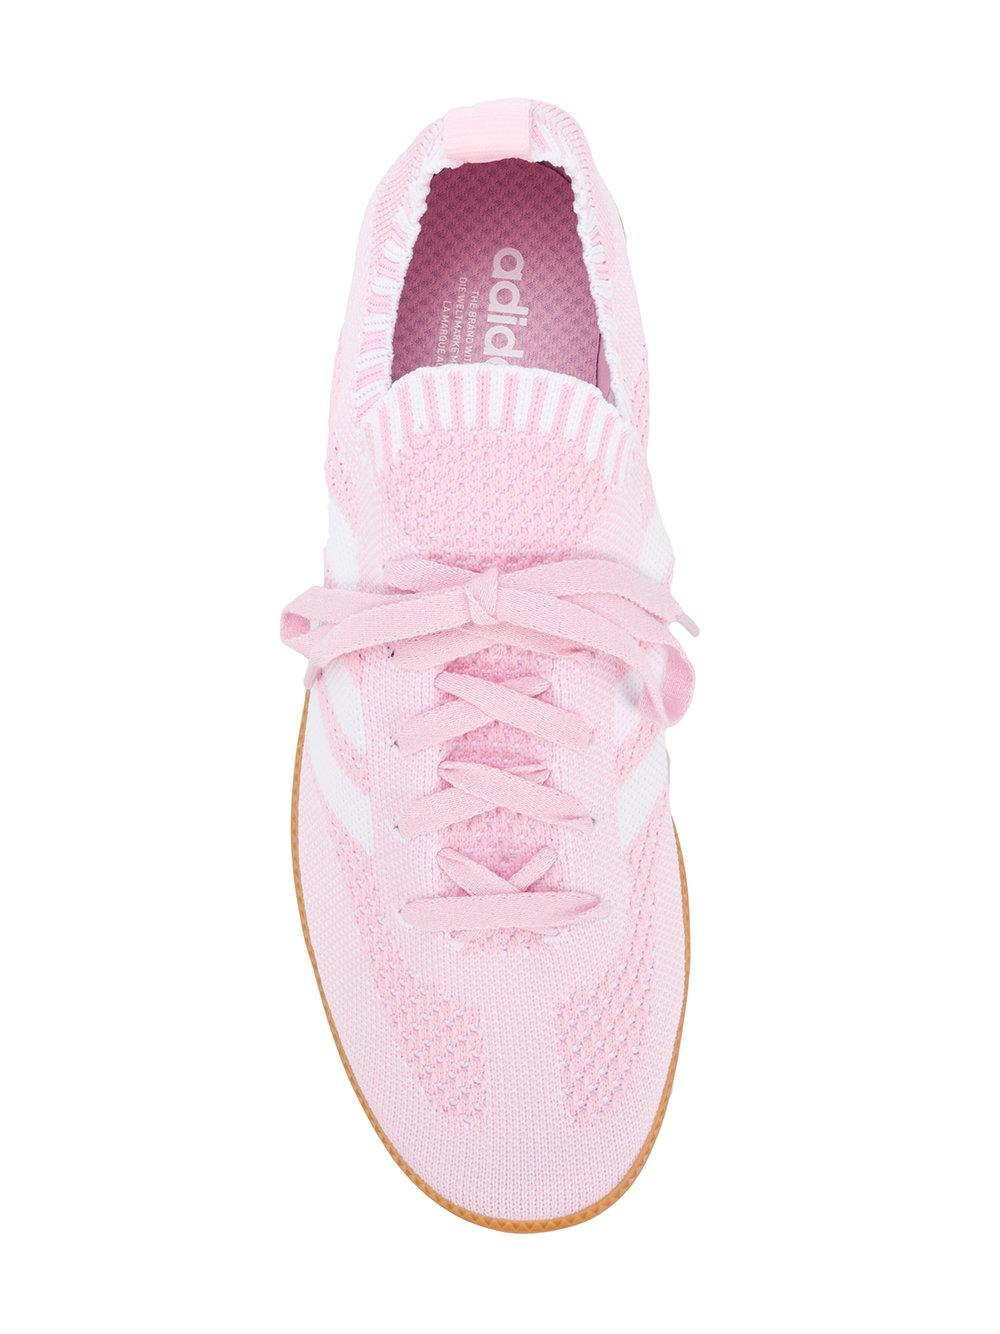 reputable site a2a50 aa608 adidas-Pink-Purple-Samba-Primeknit-Sneakers.jpeg